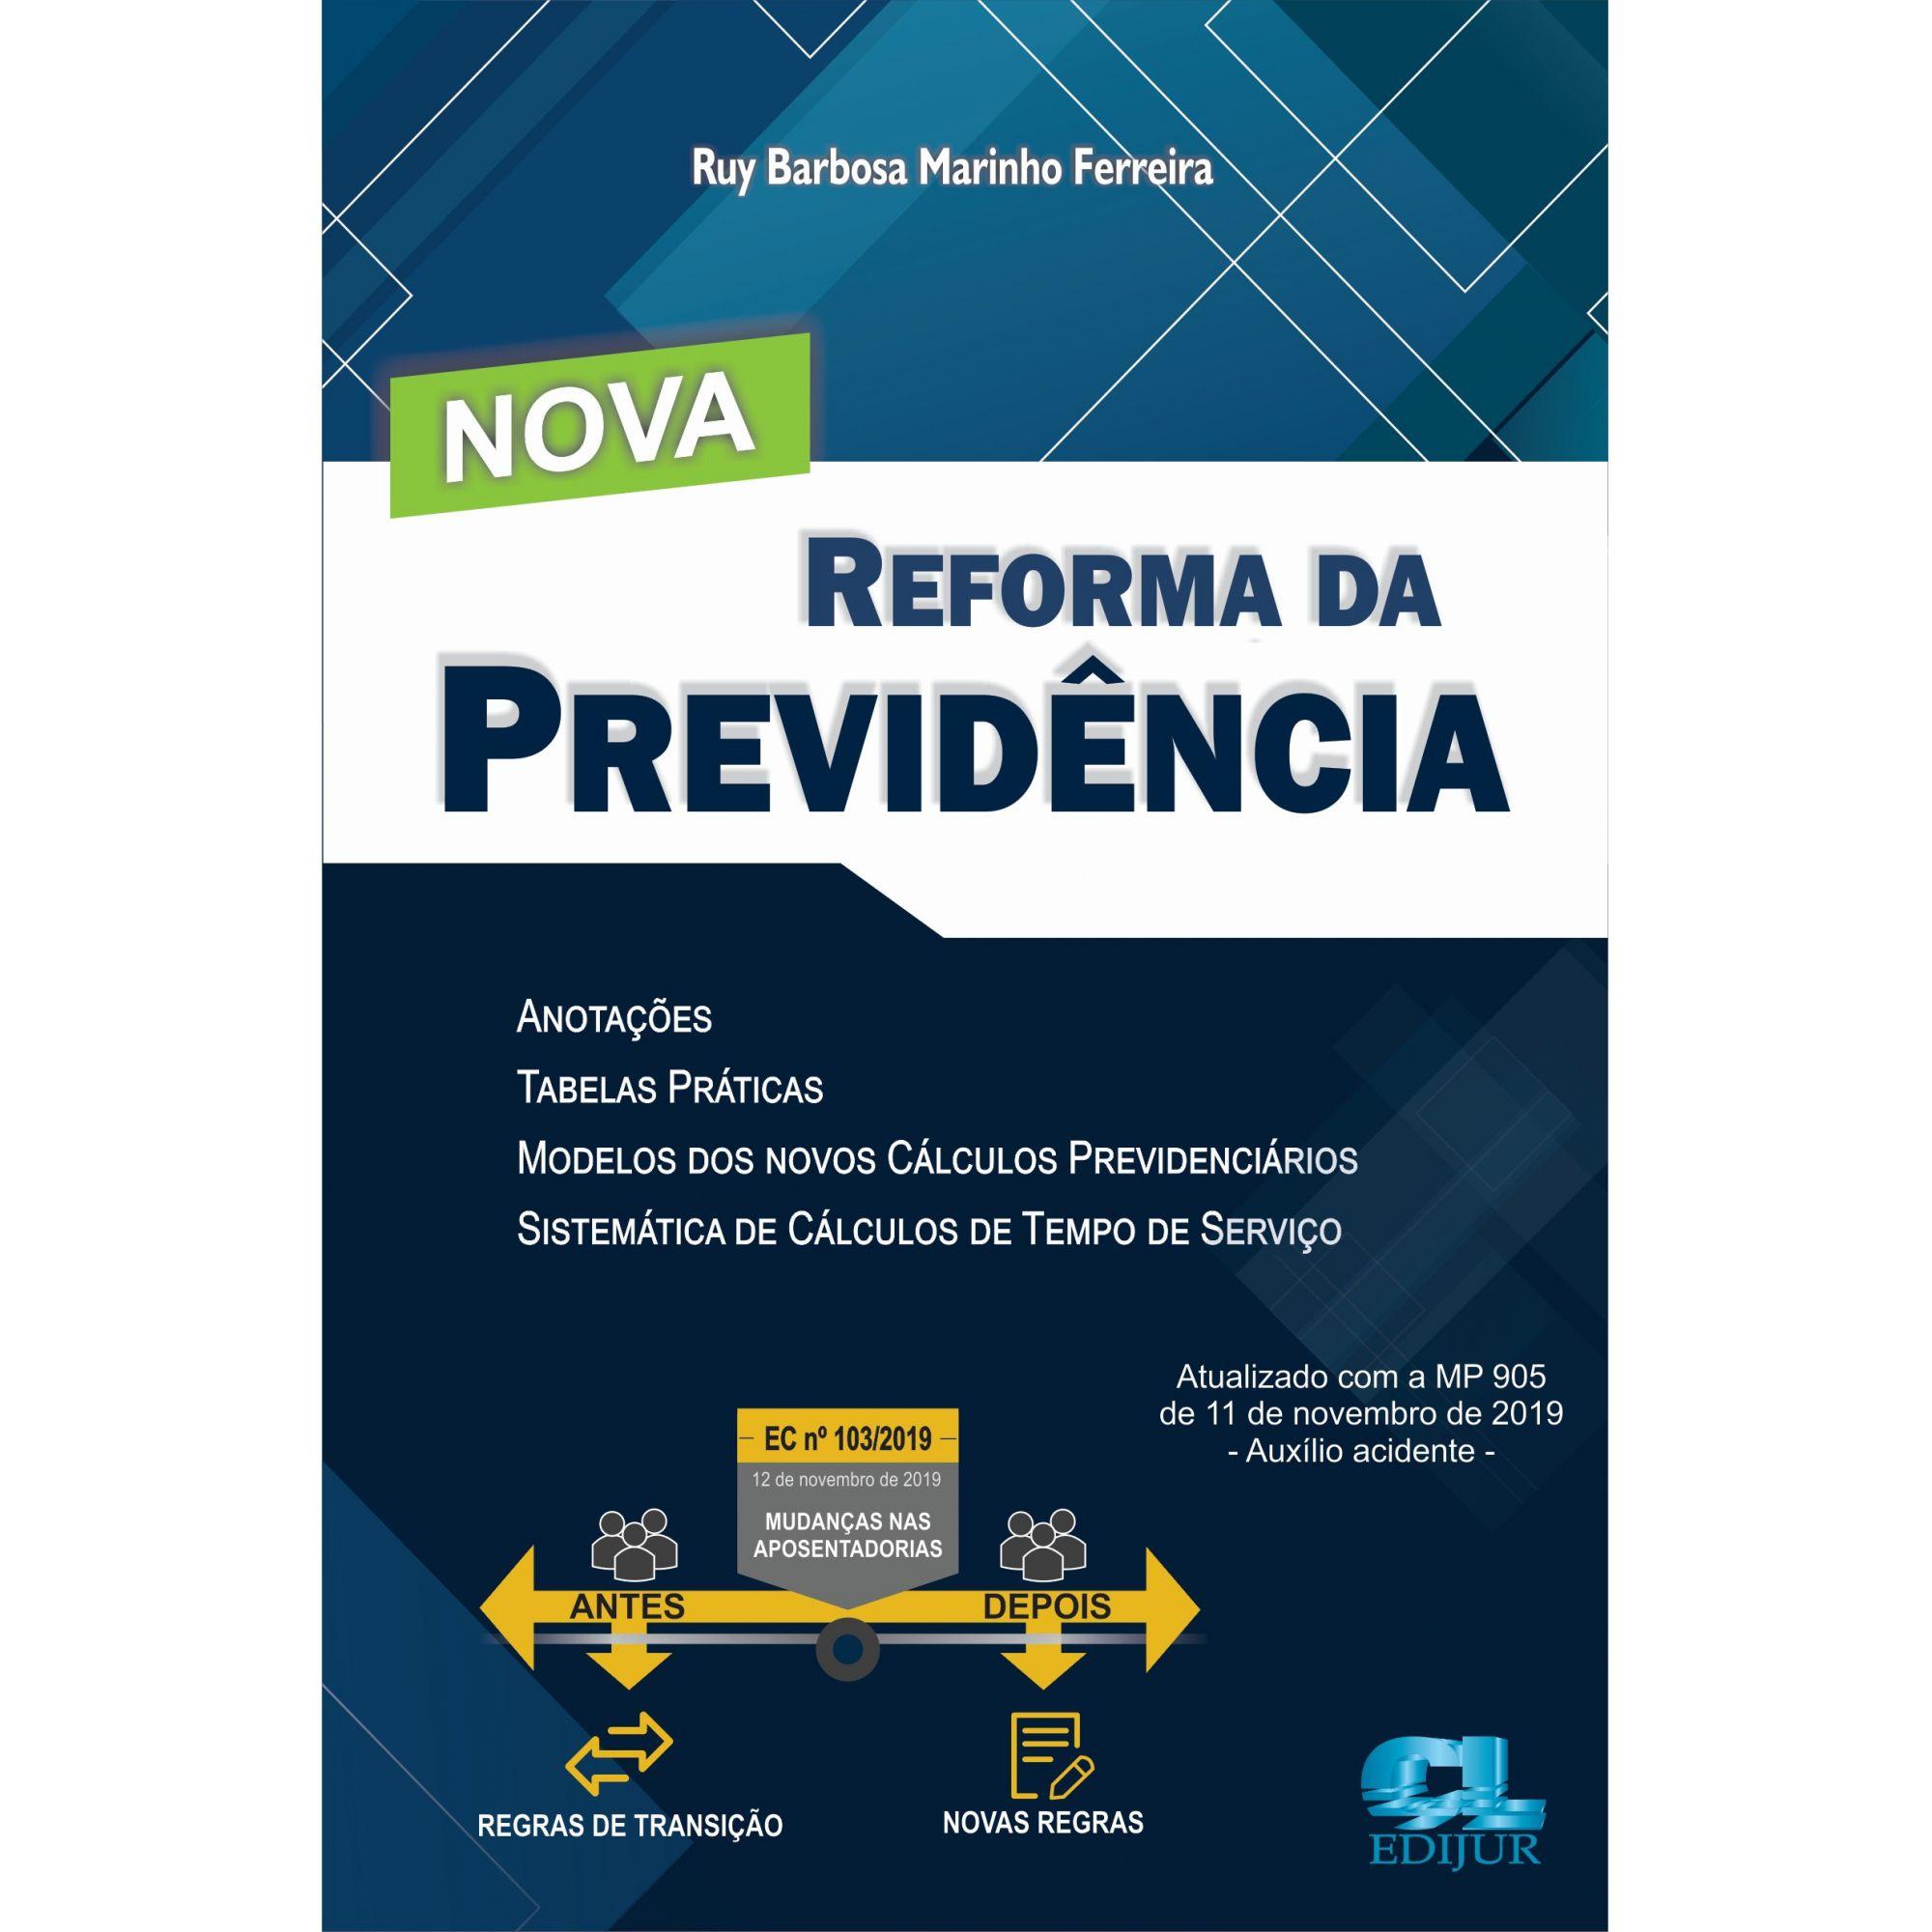 Nova Reforma da Previdência  - Edijur Editora